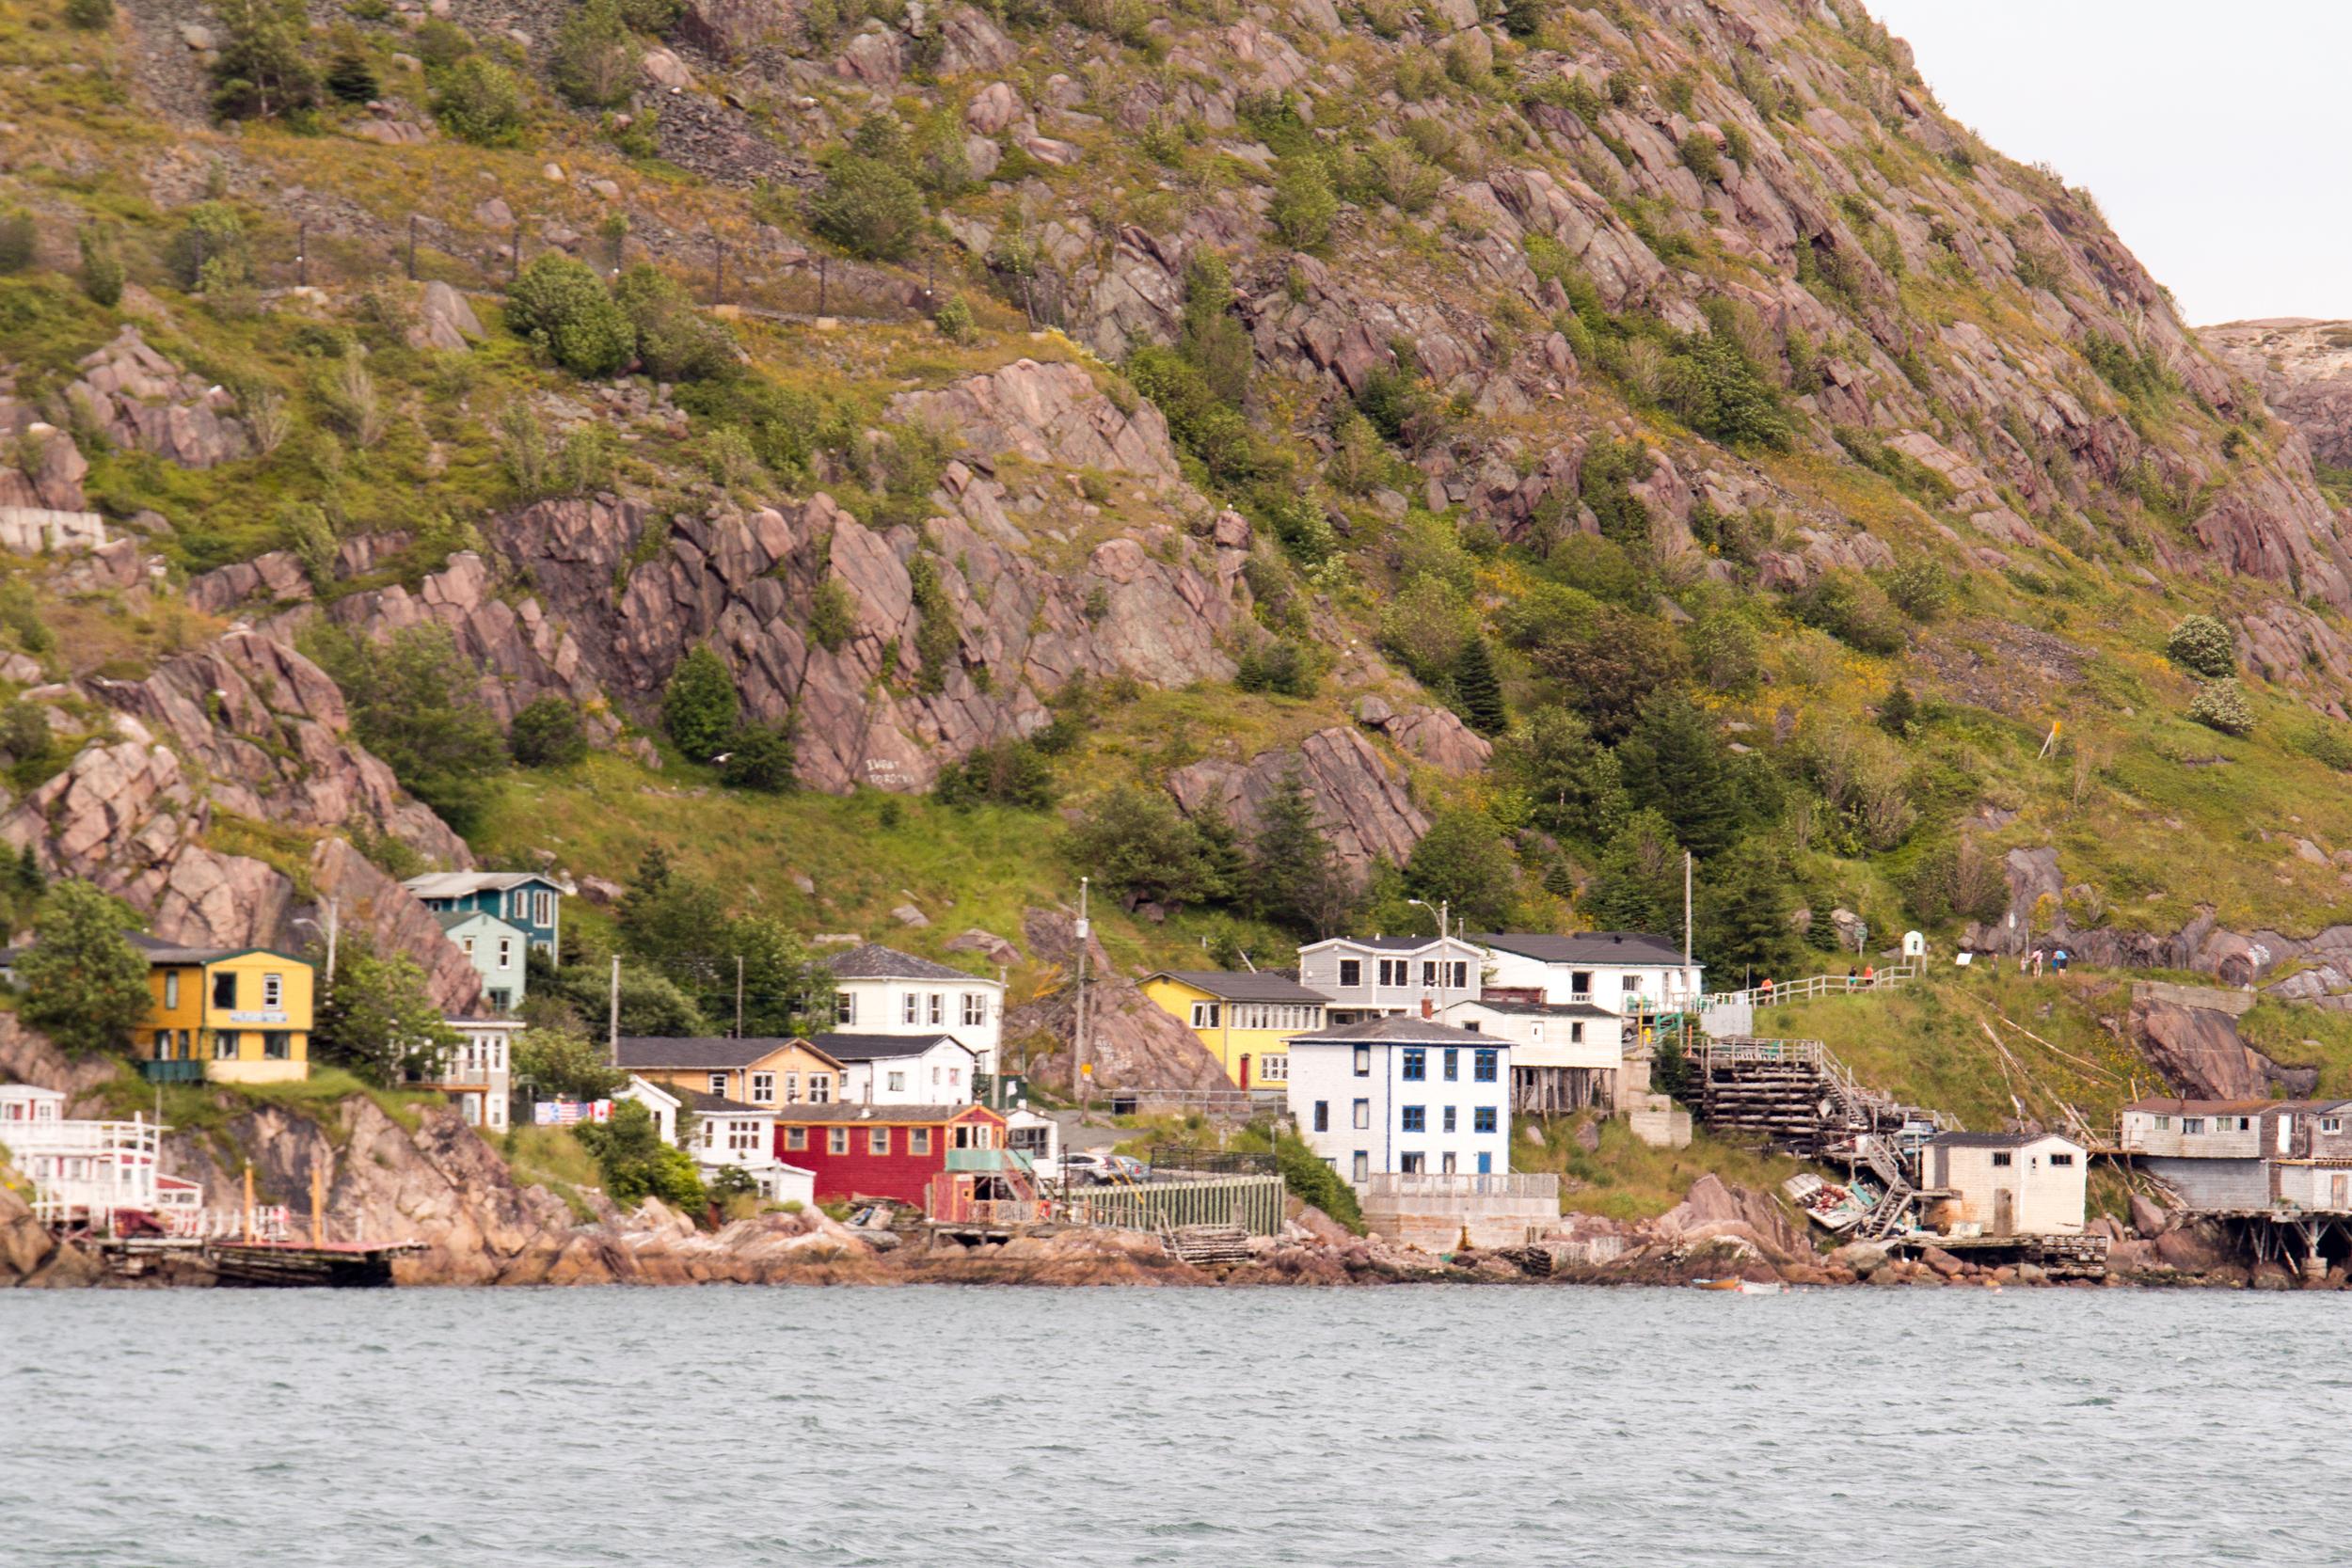 Signal Hill, St. Jon's, Newfoundland